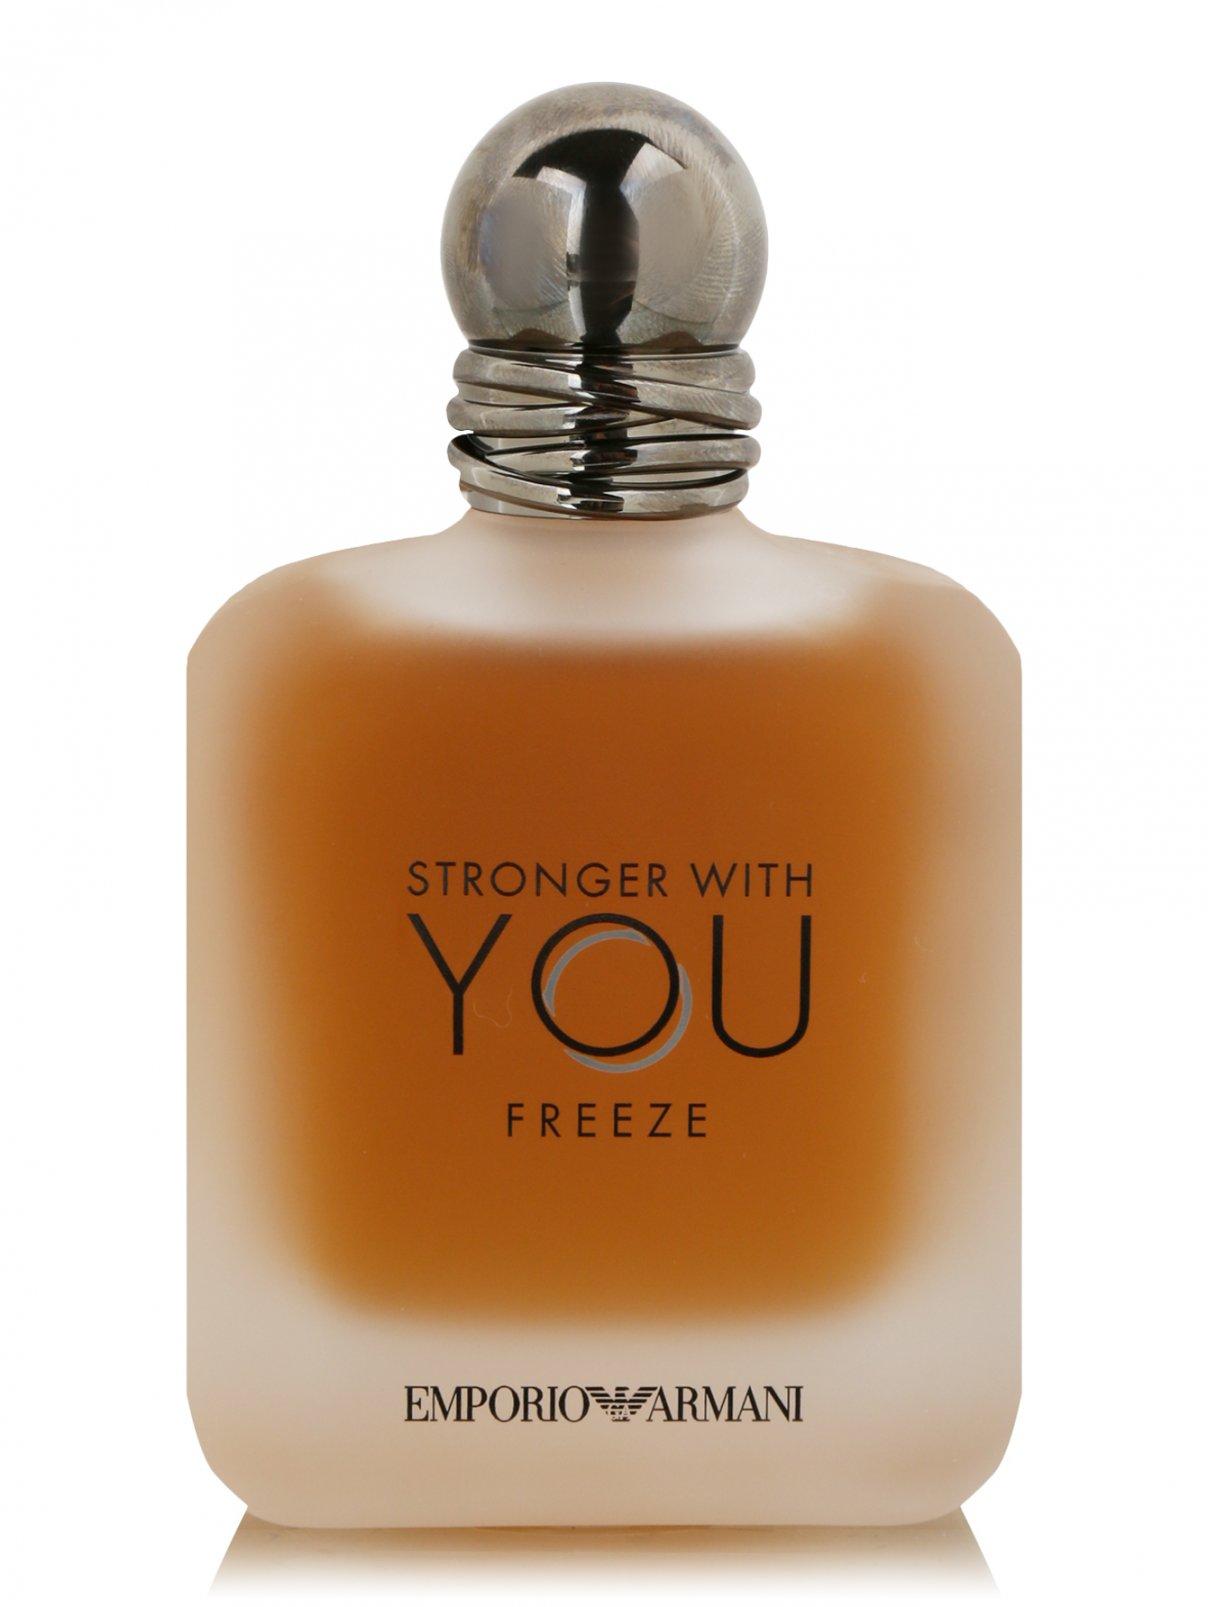 Туалетная вода 100 мл Emporio Armani Stronger with you Freeze Giorgio Armani  –  Общий вид